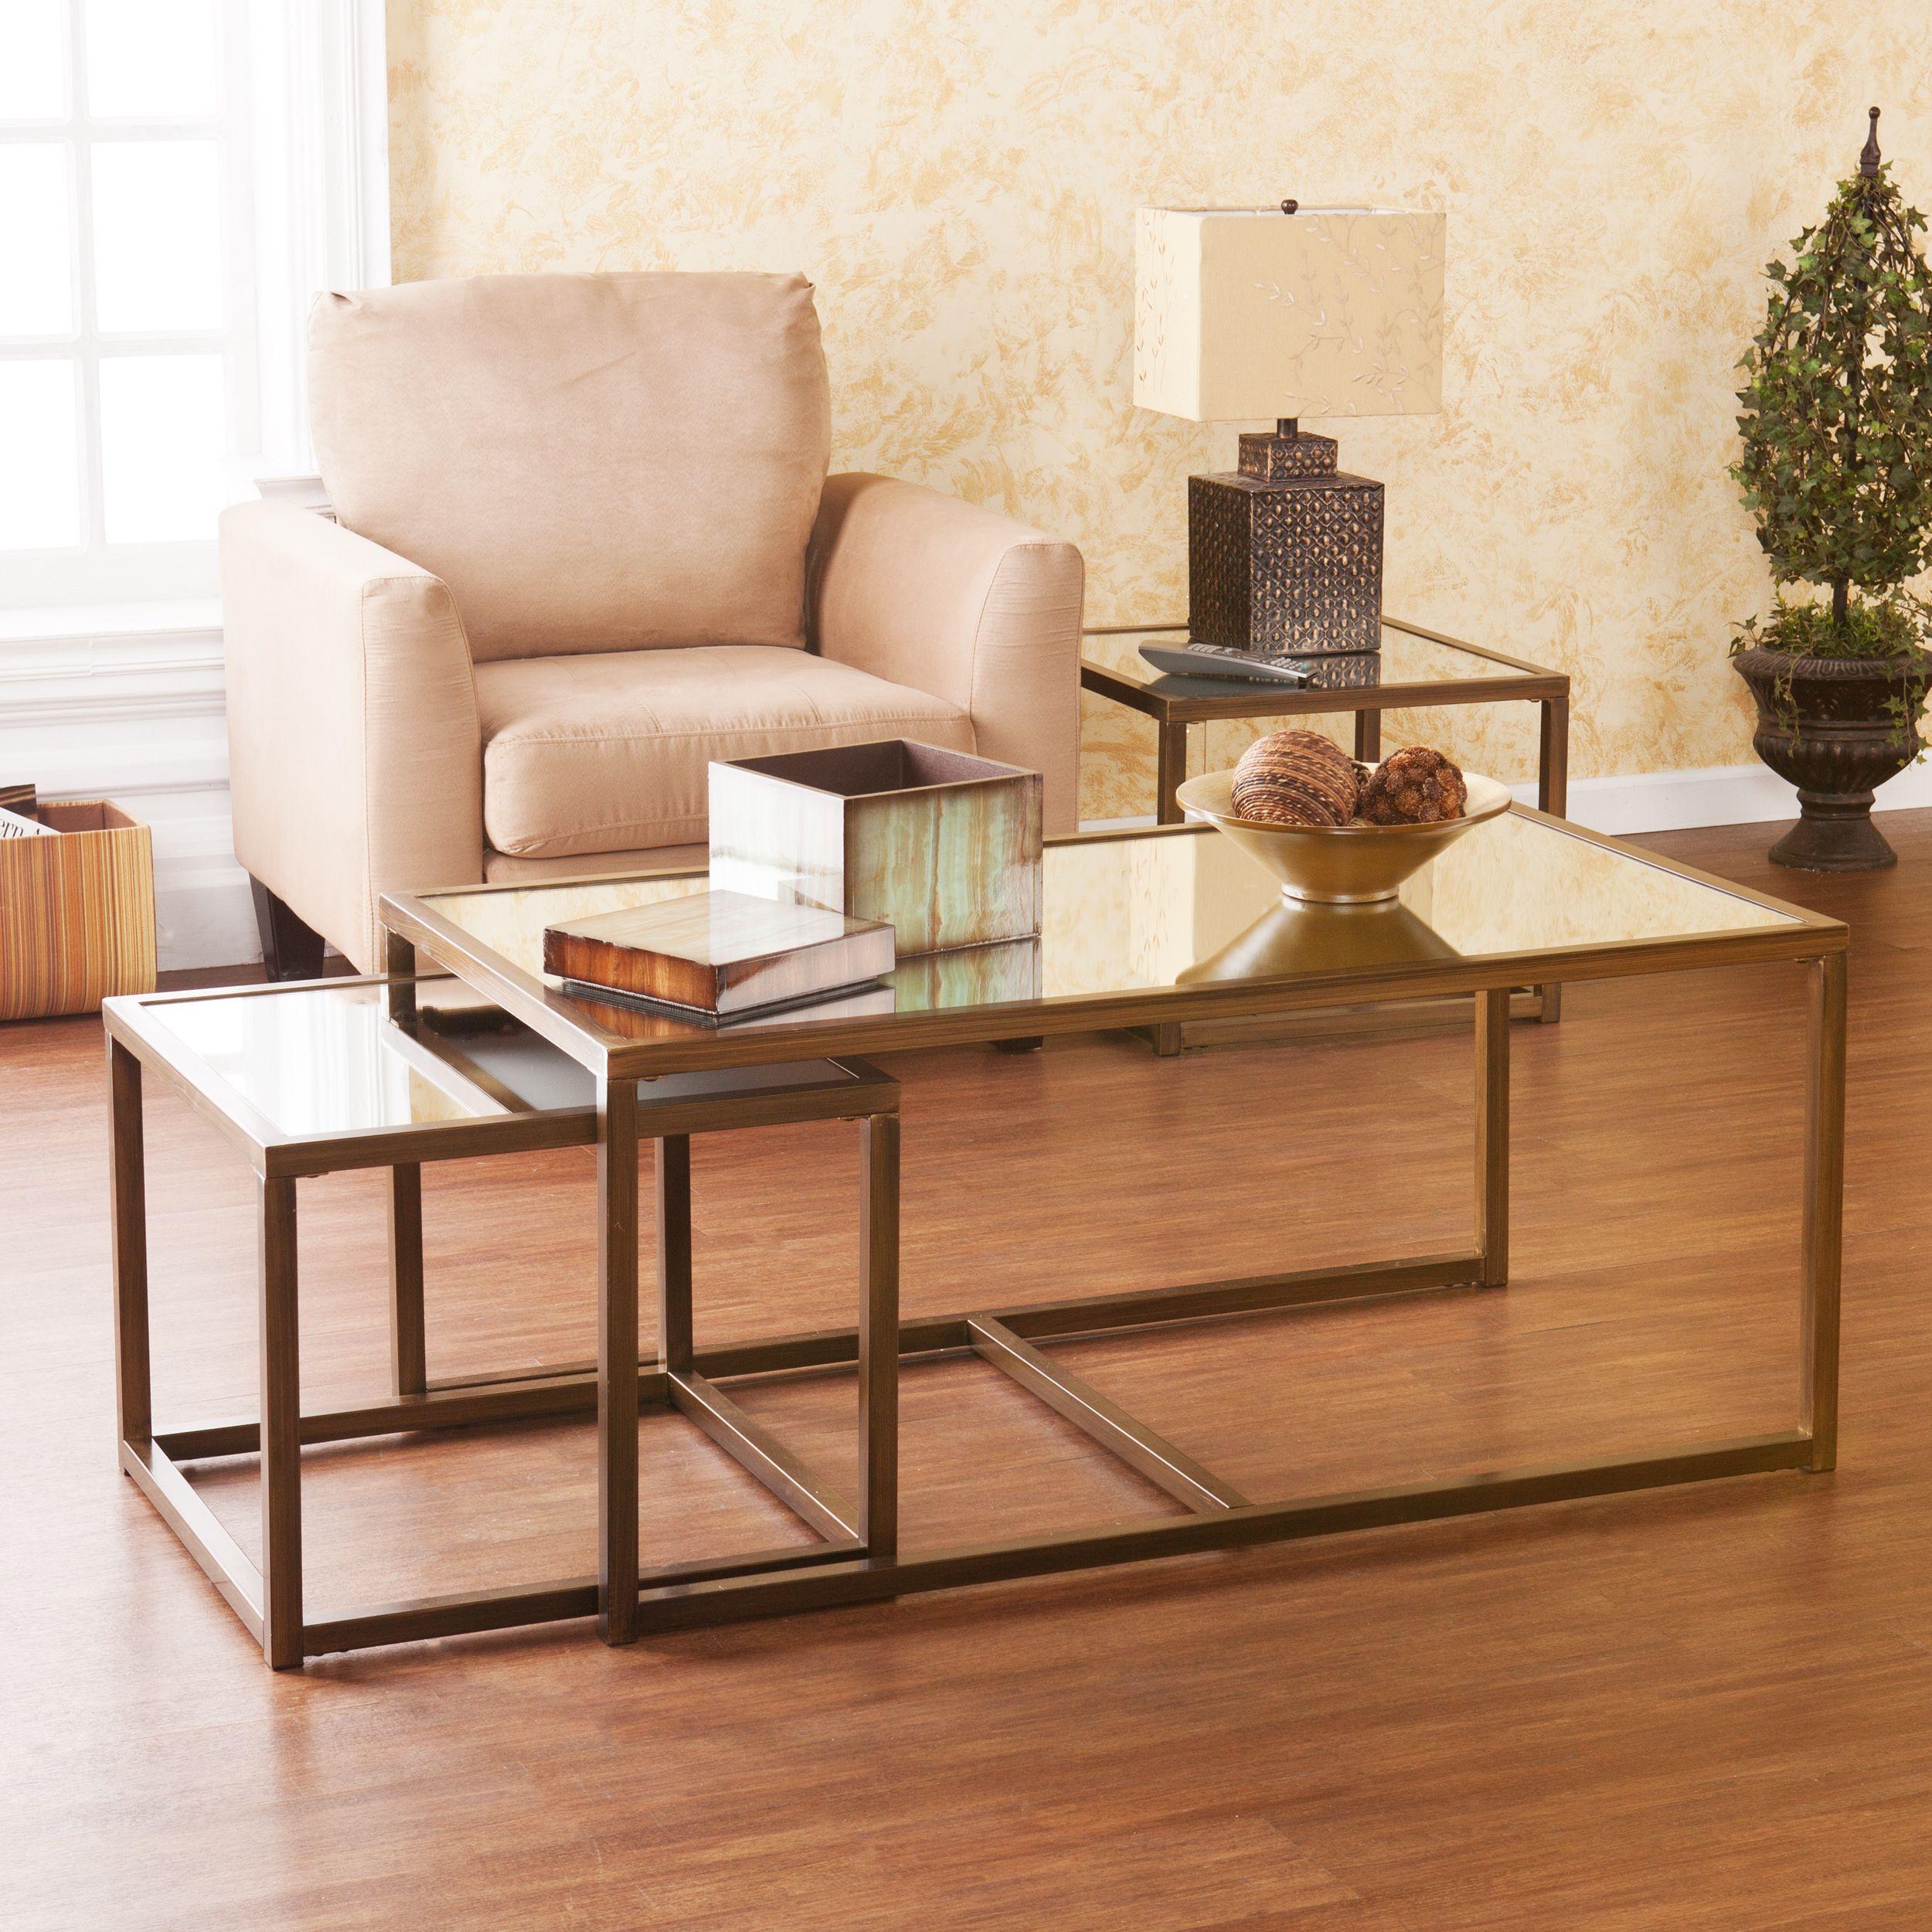 Harper Blvd Morganton Nesting Coffee/ End Table 3pc Set | Overstock.com Shopping - & Harper Blvd Morganton Nesting Coffee/ End Table 3pc Set | Overstock ...